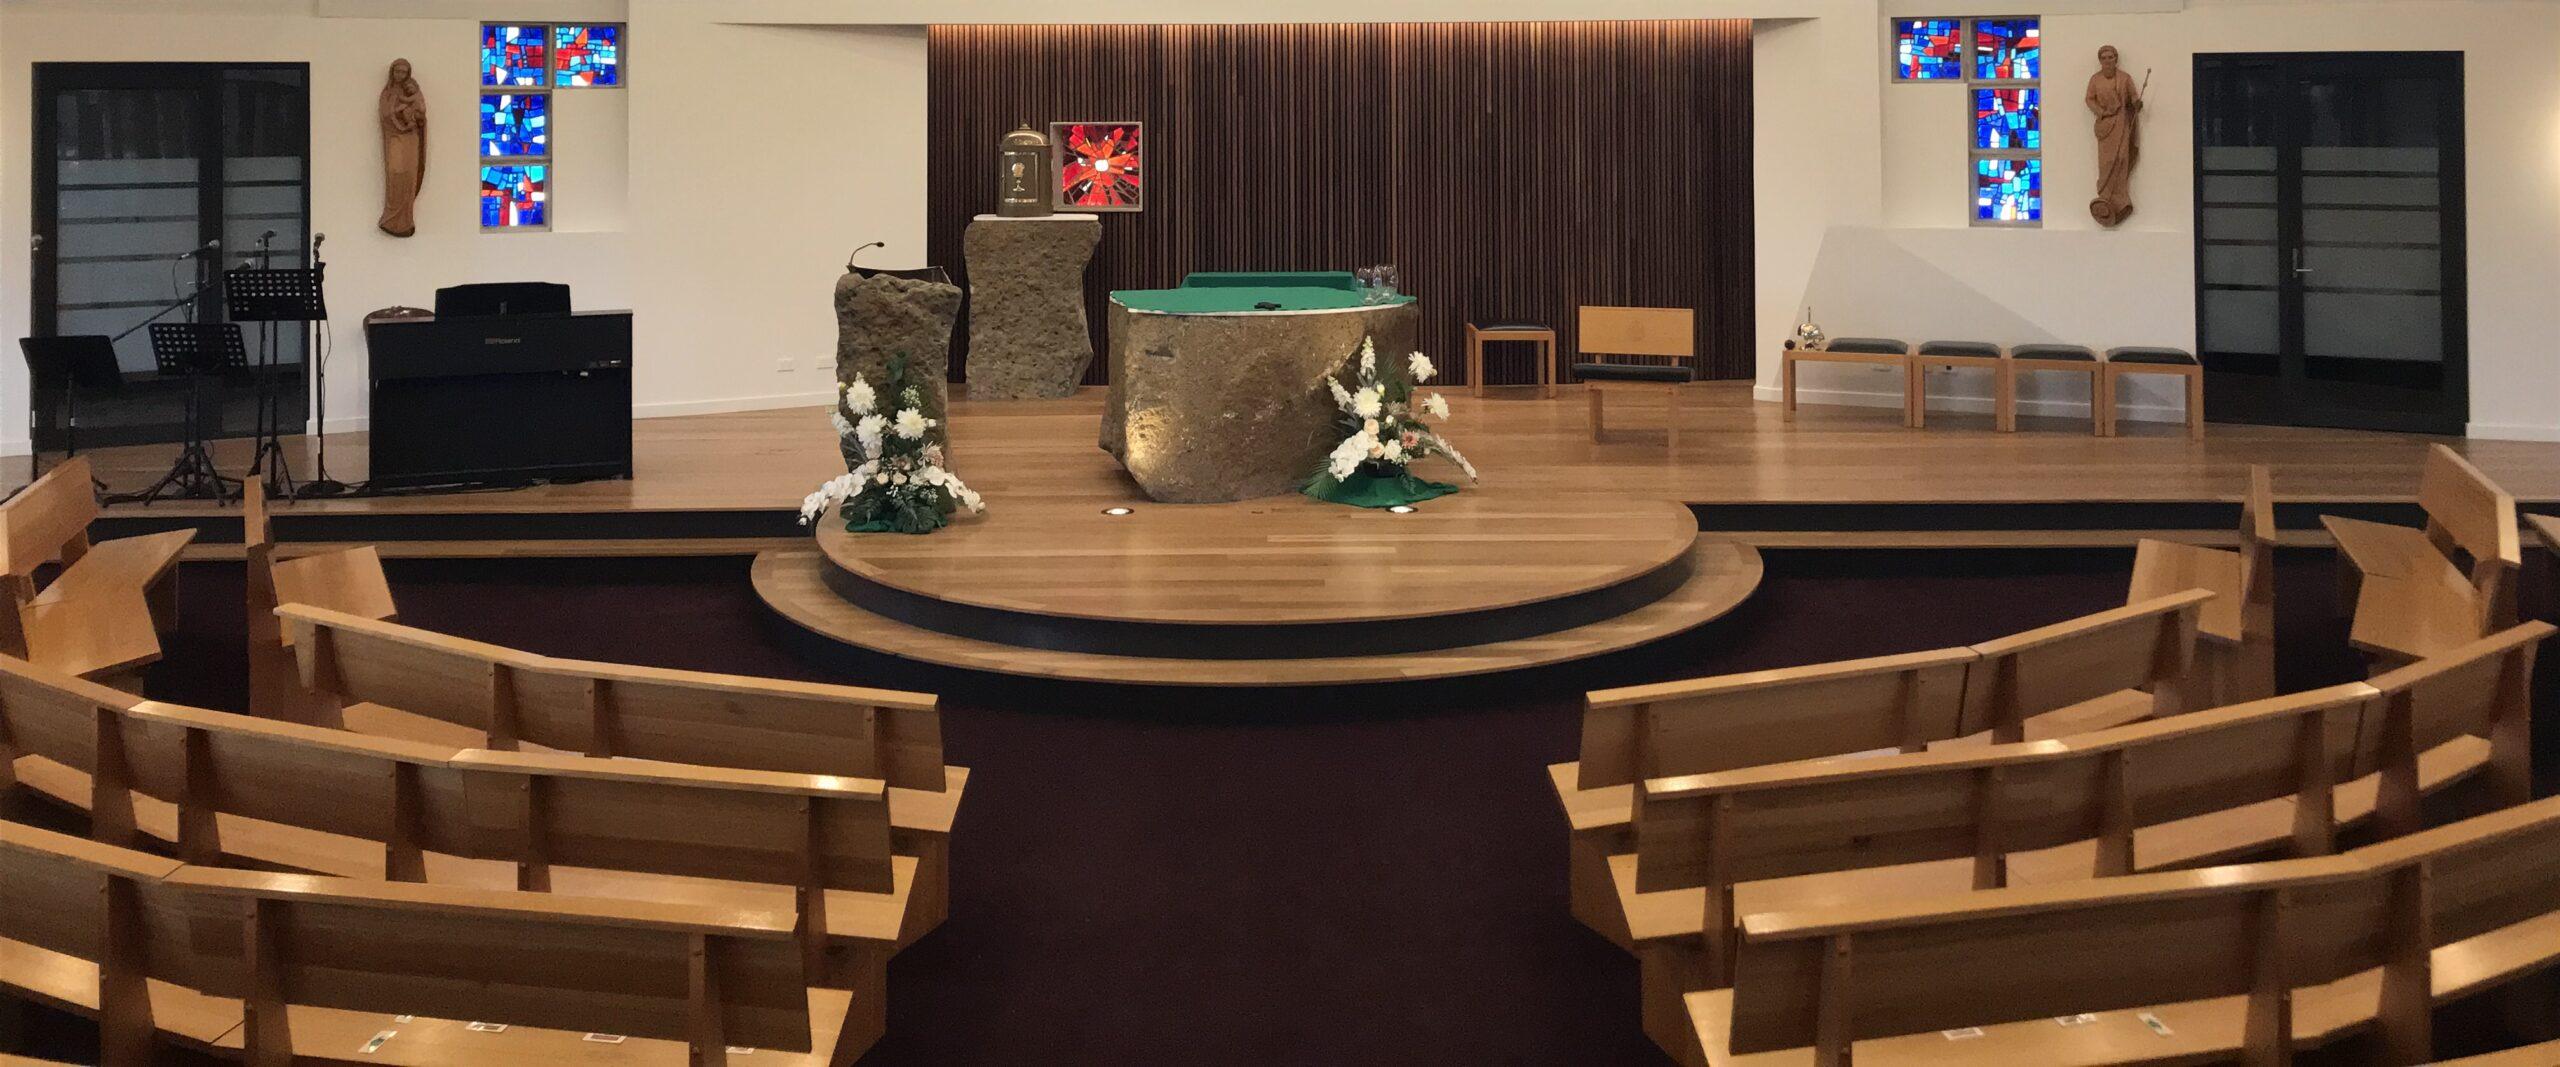 Church-wide-1-scaled